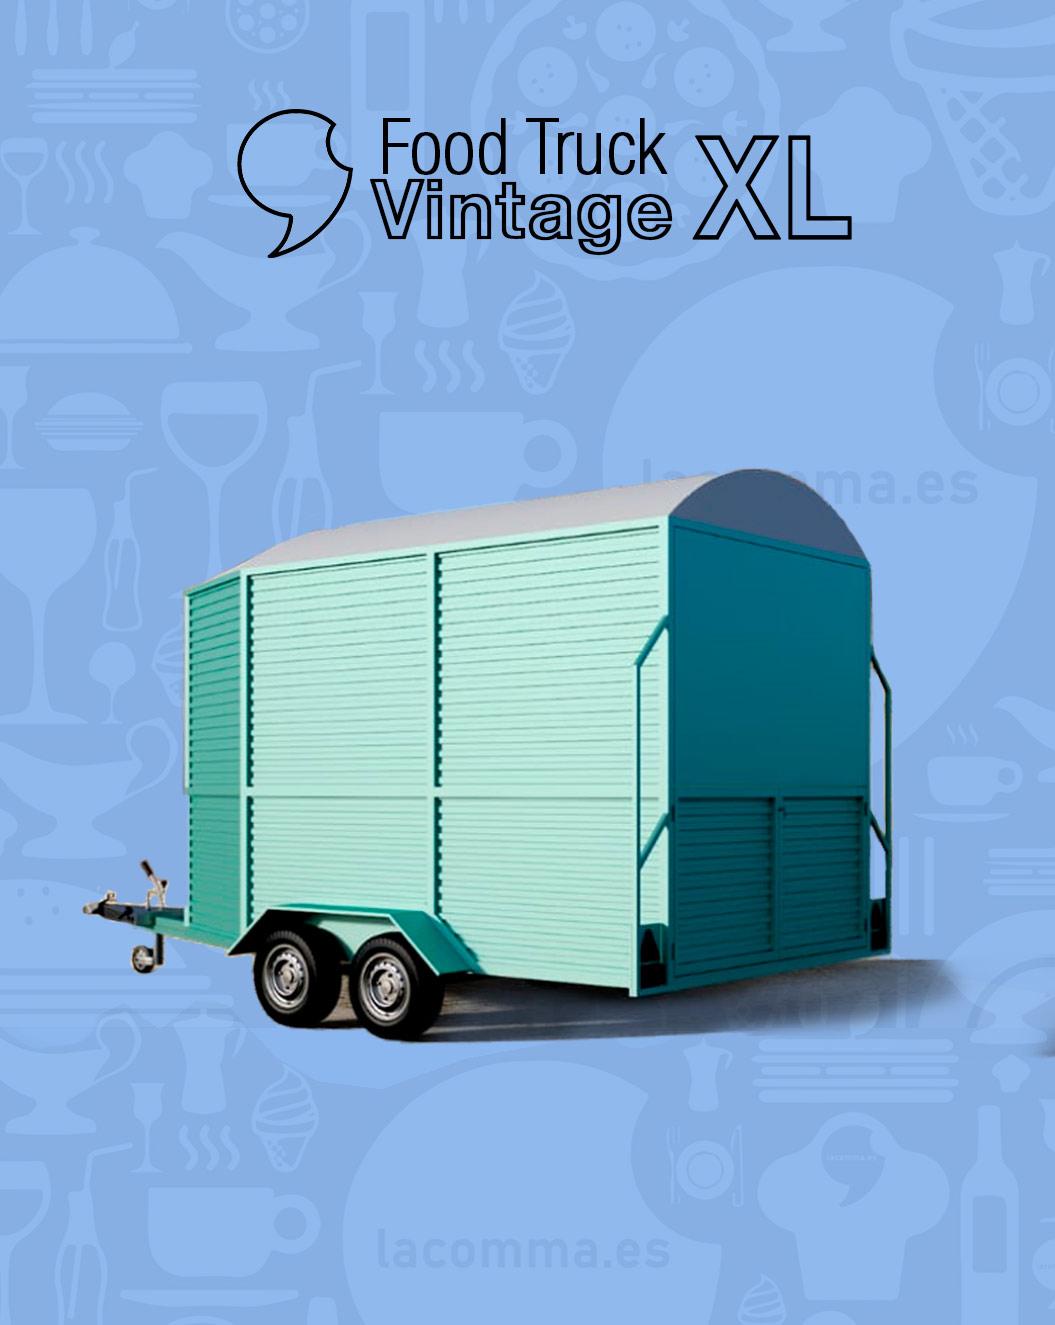 Food truck Vintage XL